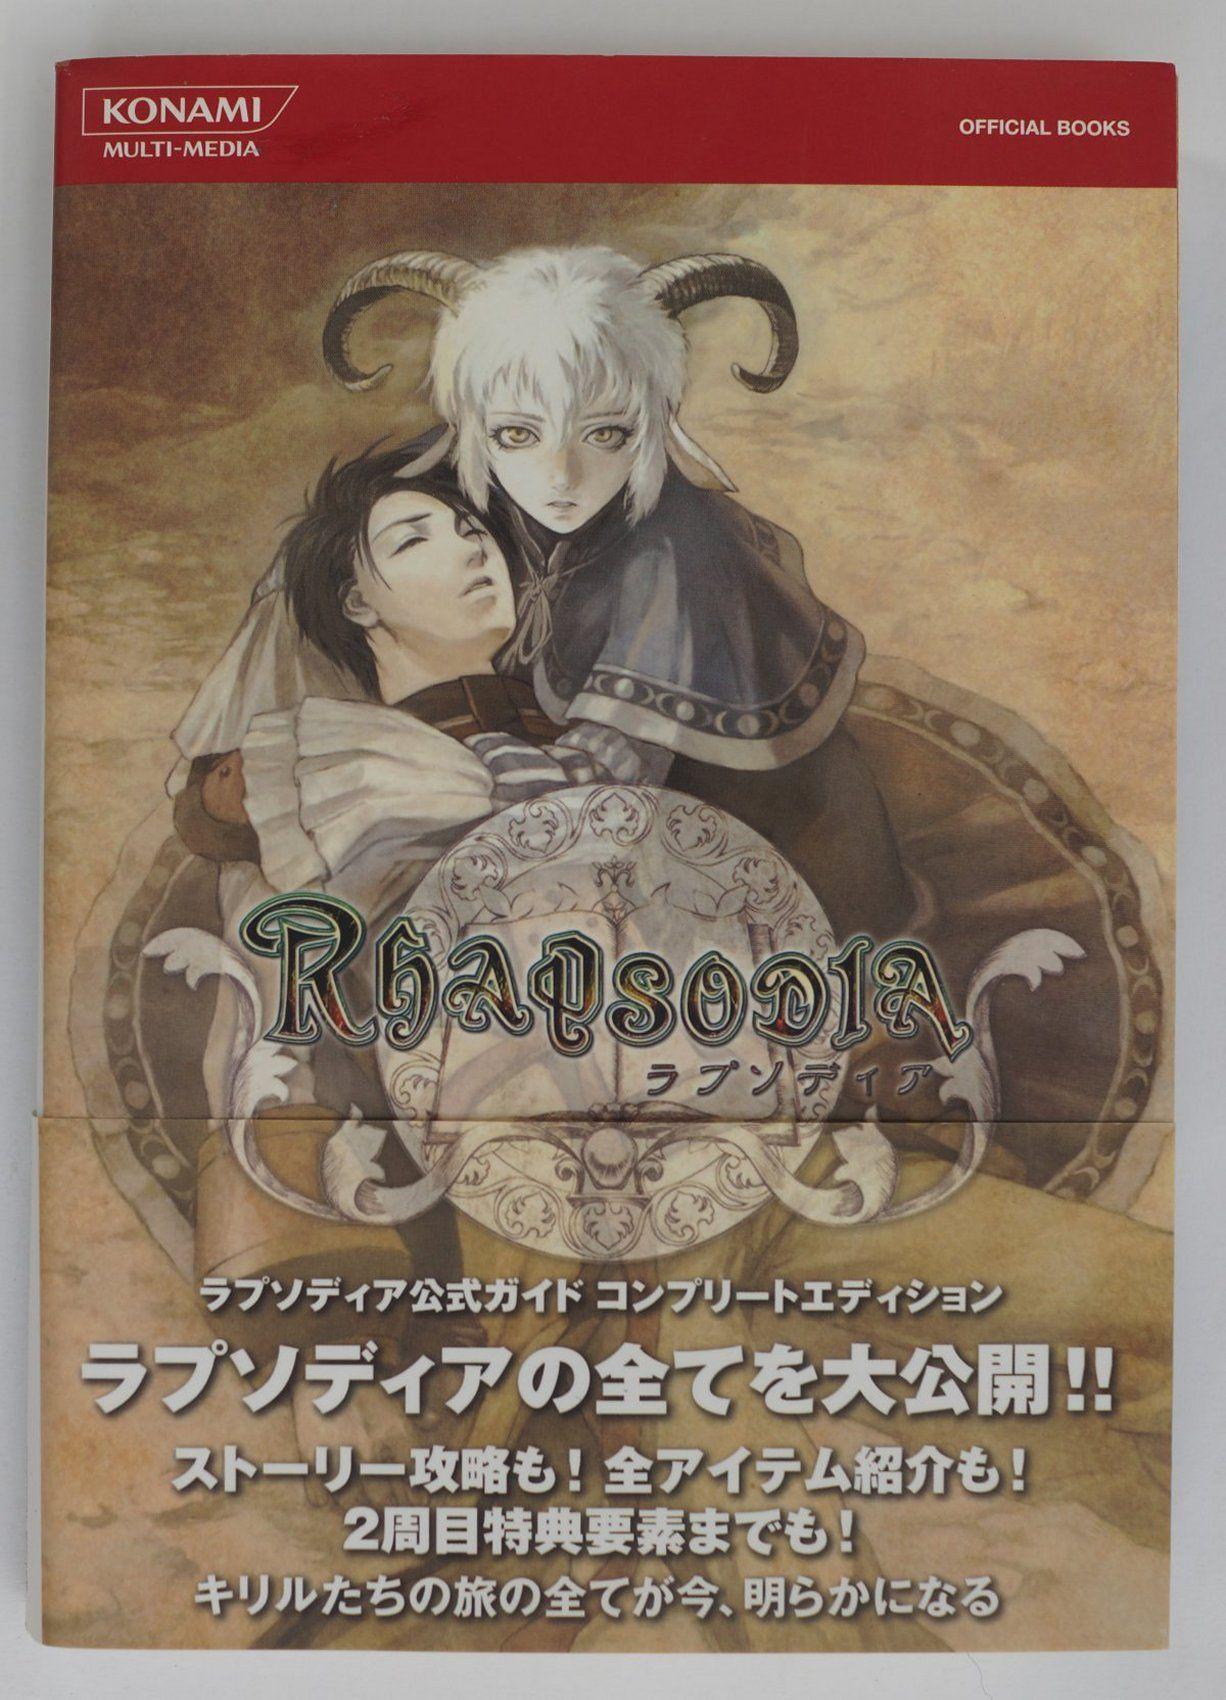 #PS32 PS2 Japanese : #Rhapsodia Official Guide Complete Edition http://www.japanstuff.biz